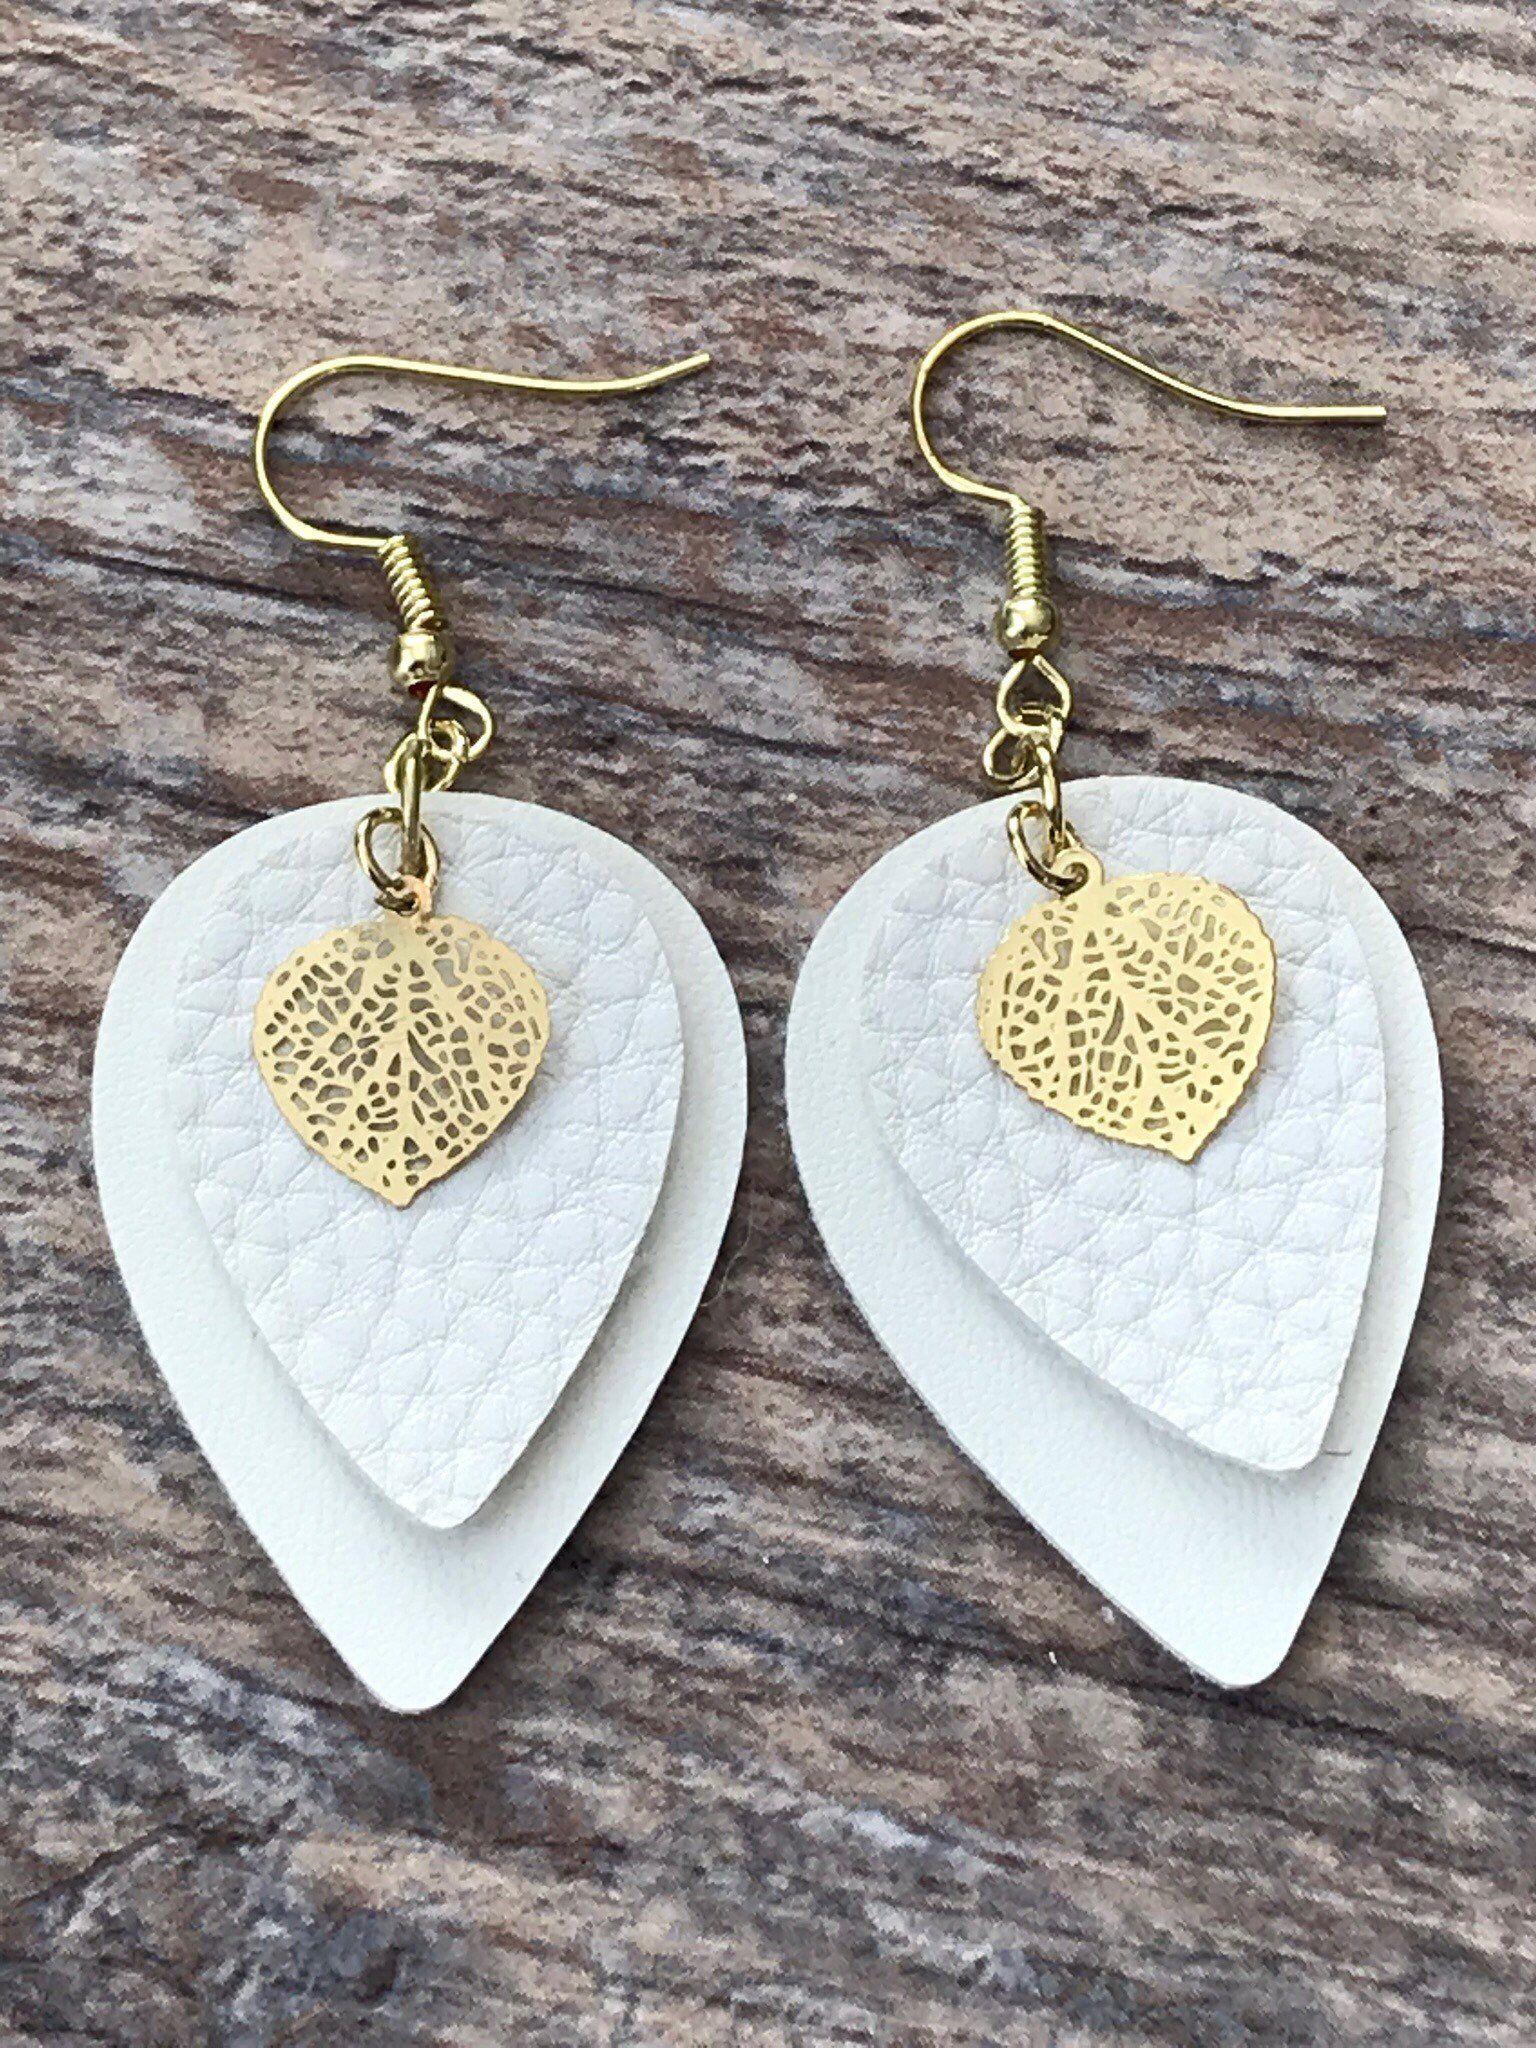 Photo of Faux leather earring, Faux leather teardrop earrings, White faux leather earrings with metal leaf charm, Dangle earrings